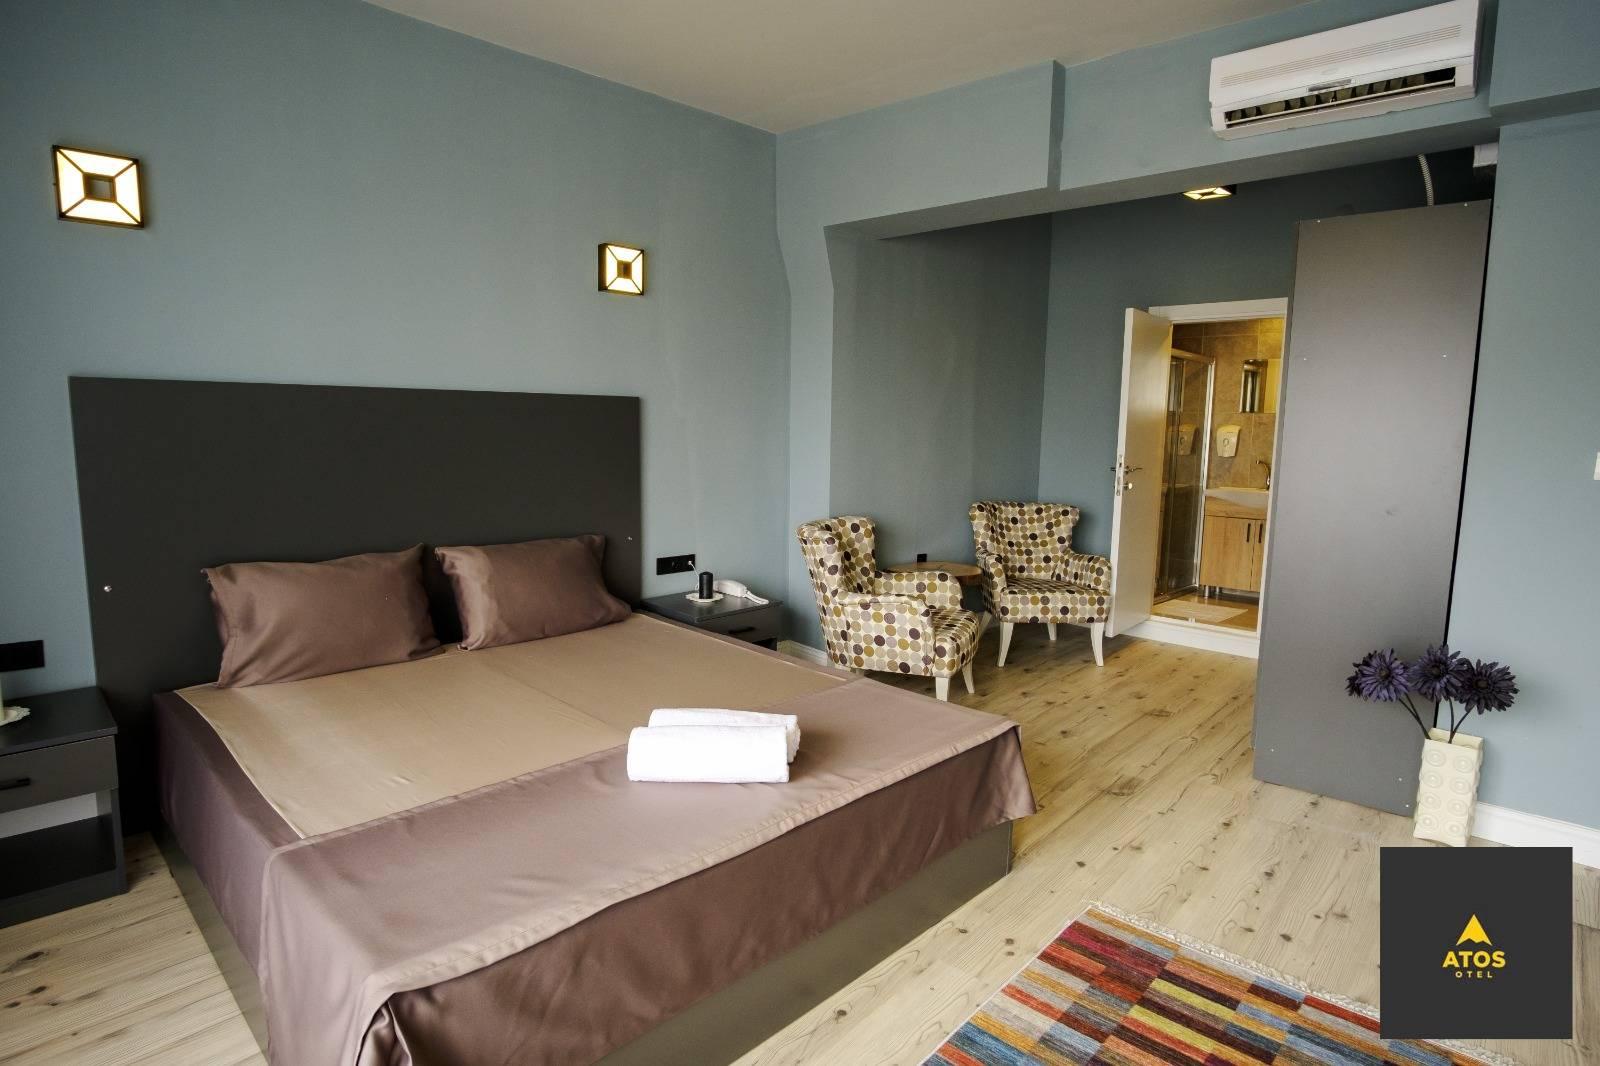 Atos Otel, Eskişehir, Tepebaşı, 36195